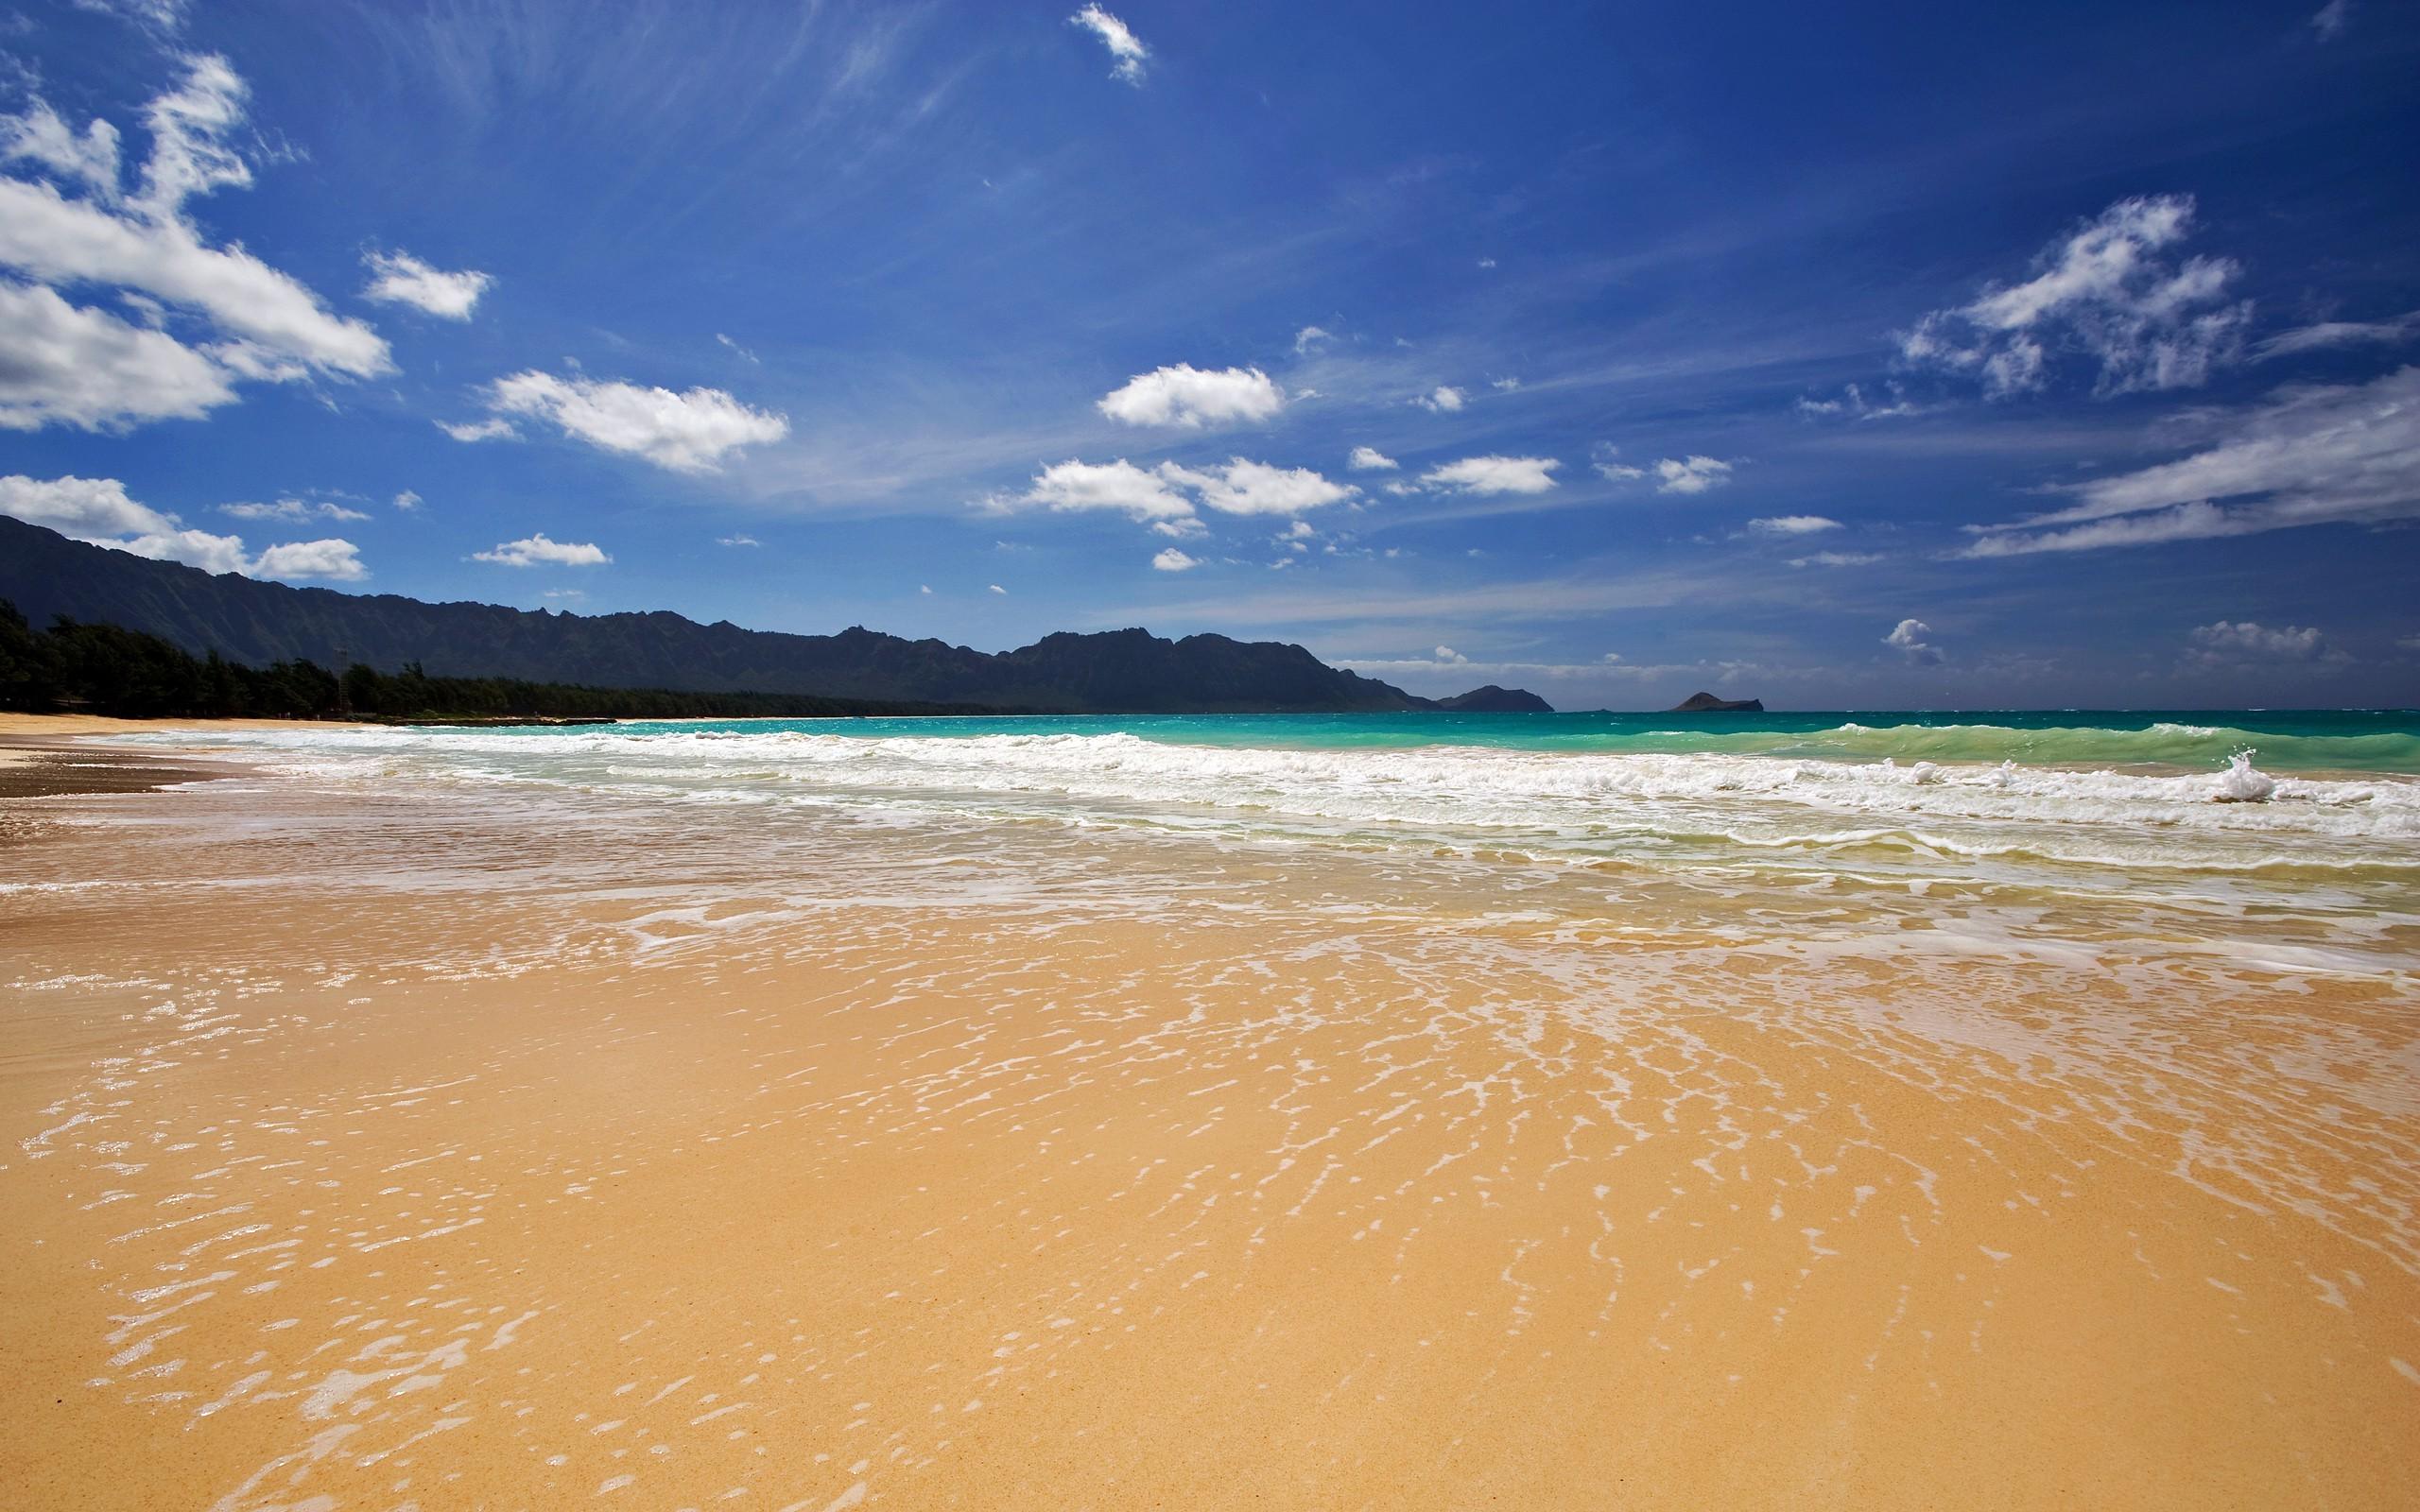 картинки песчаного берега и океана цветов цитруса